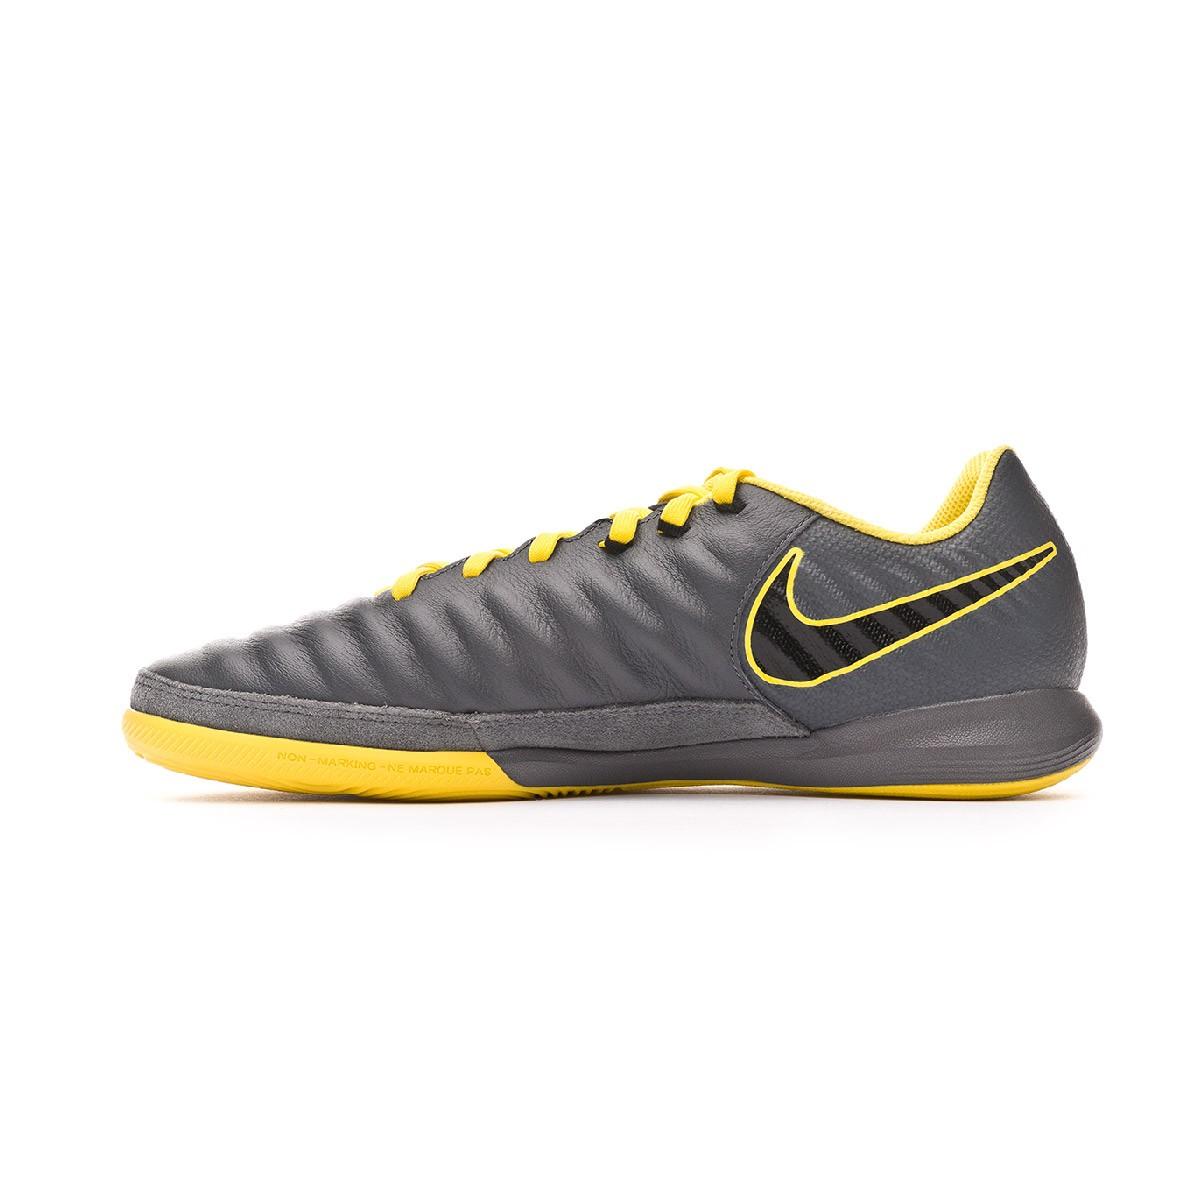 bc2422ac8ab2c Futsal Boot Nike Tiempo LegendX VII Pro IC Dark grey-Black-Optical yellow -  Football store Fútbol Emotion